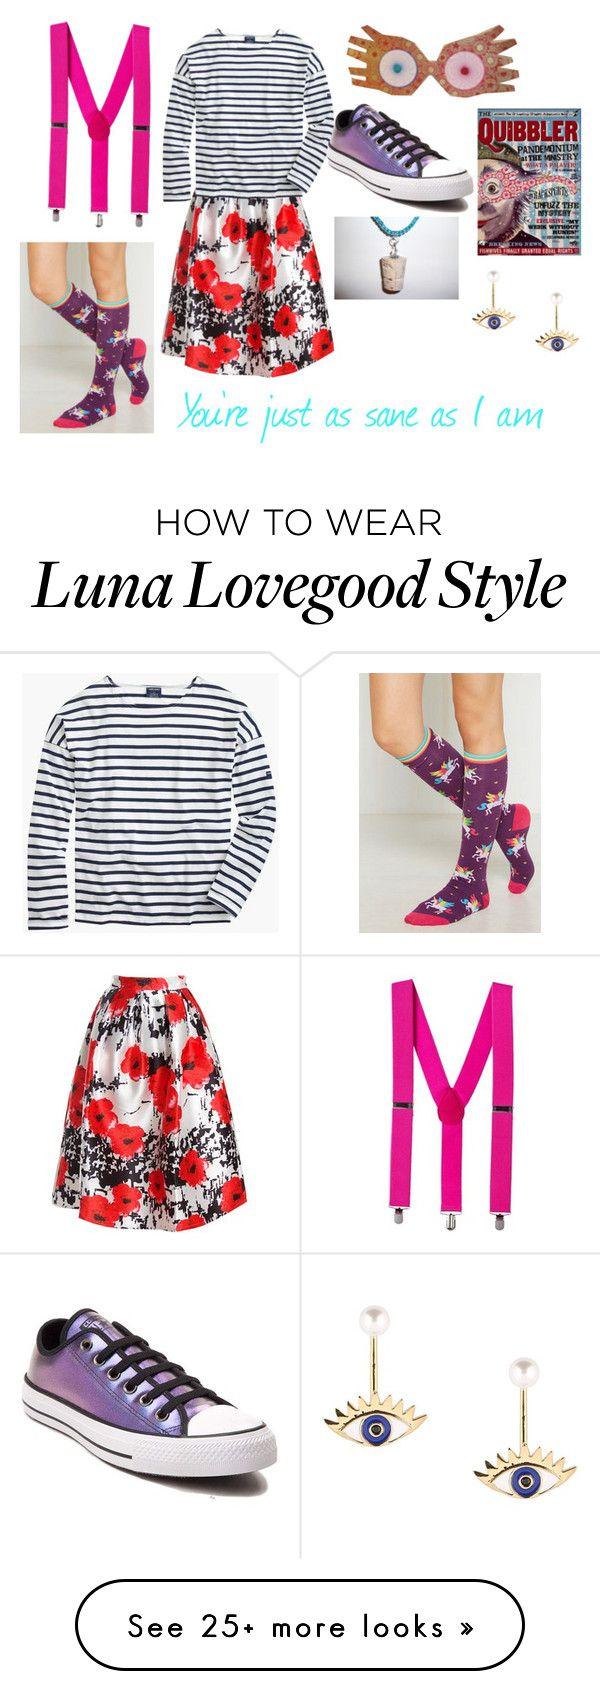 """Luna Lovegood"" by crybabyquinn on Polyvore featuring Luna, Sans Souci, Saint James and Converse"